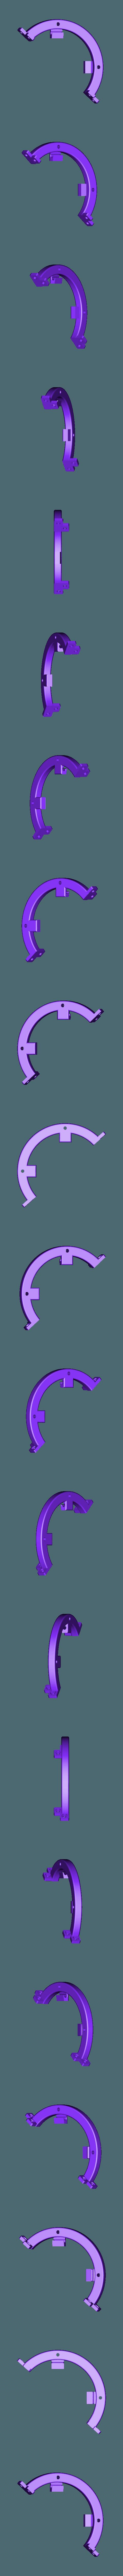 BoomExteriorTop_SIDE1.stl Download free STL file MXL 4000 Shock Mount (Custom) • 3D printer object, ProteanMan